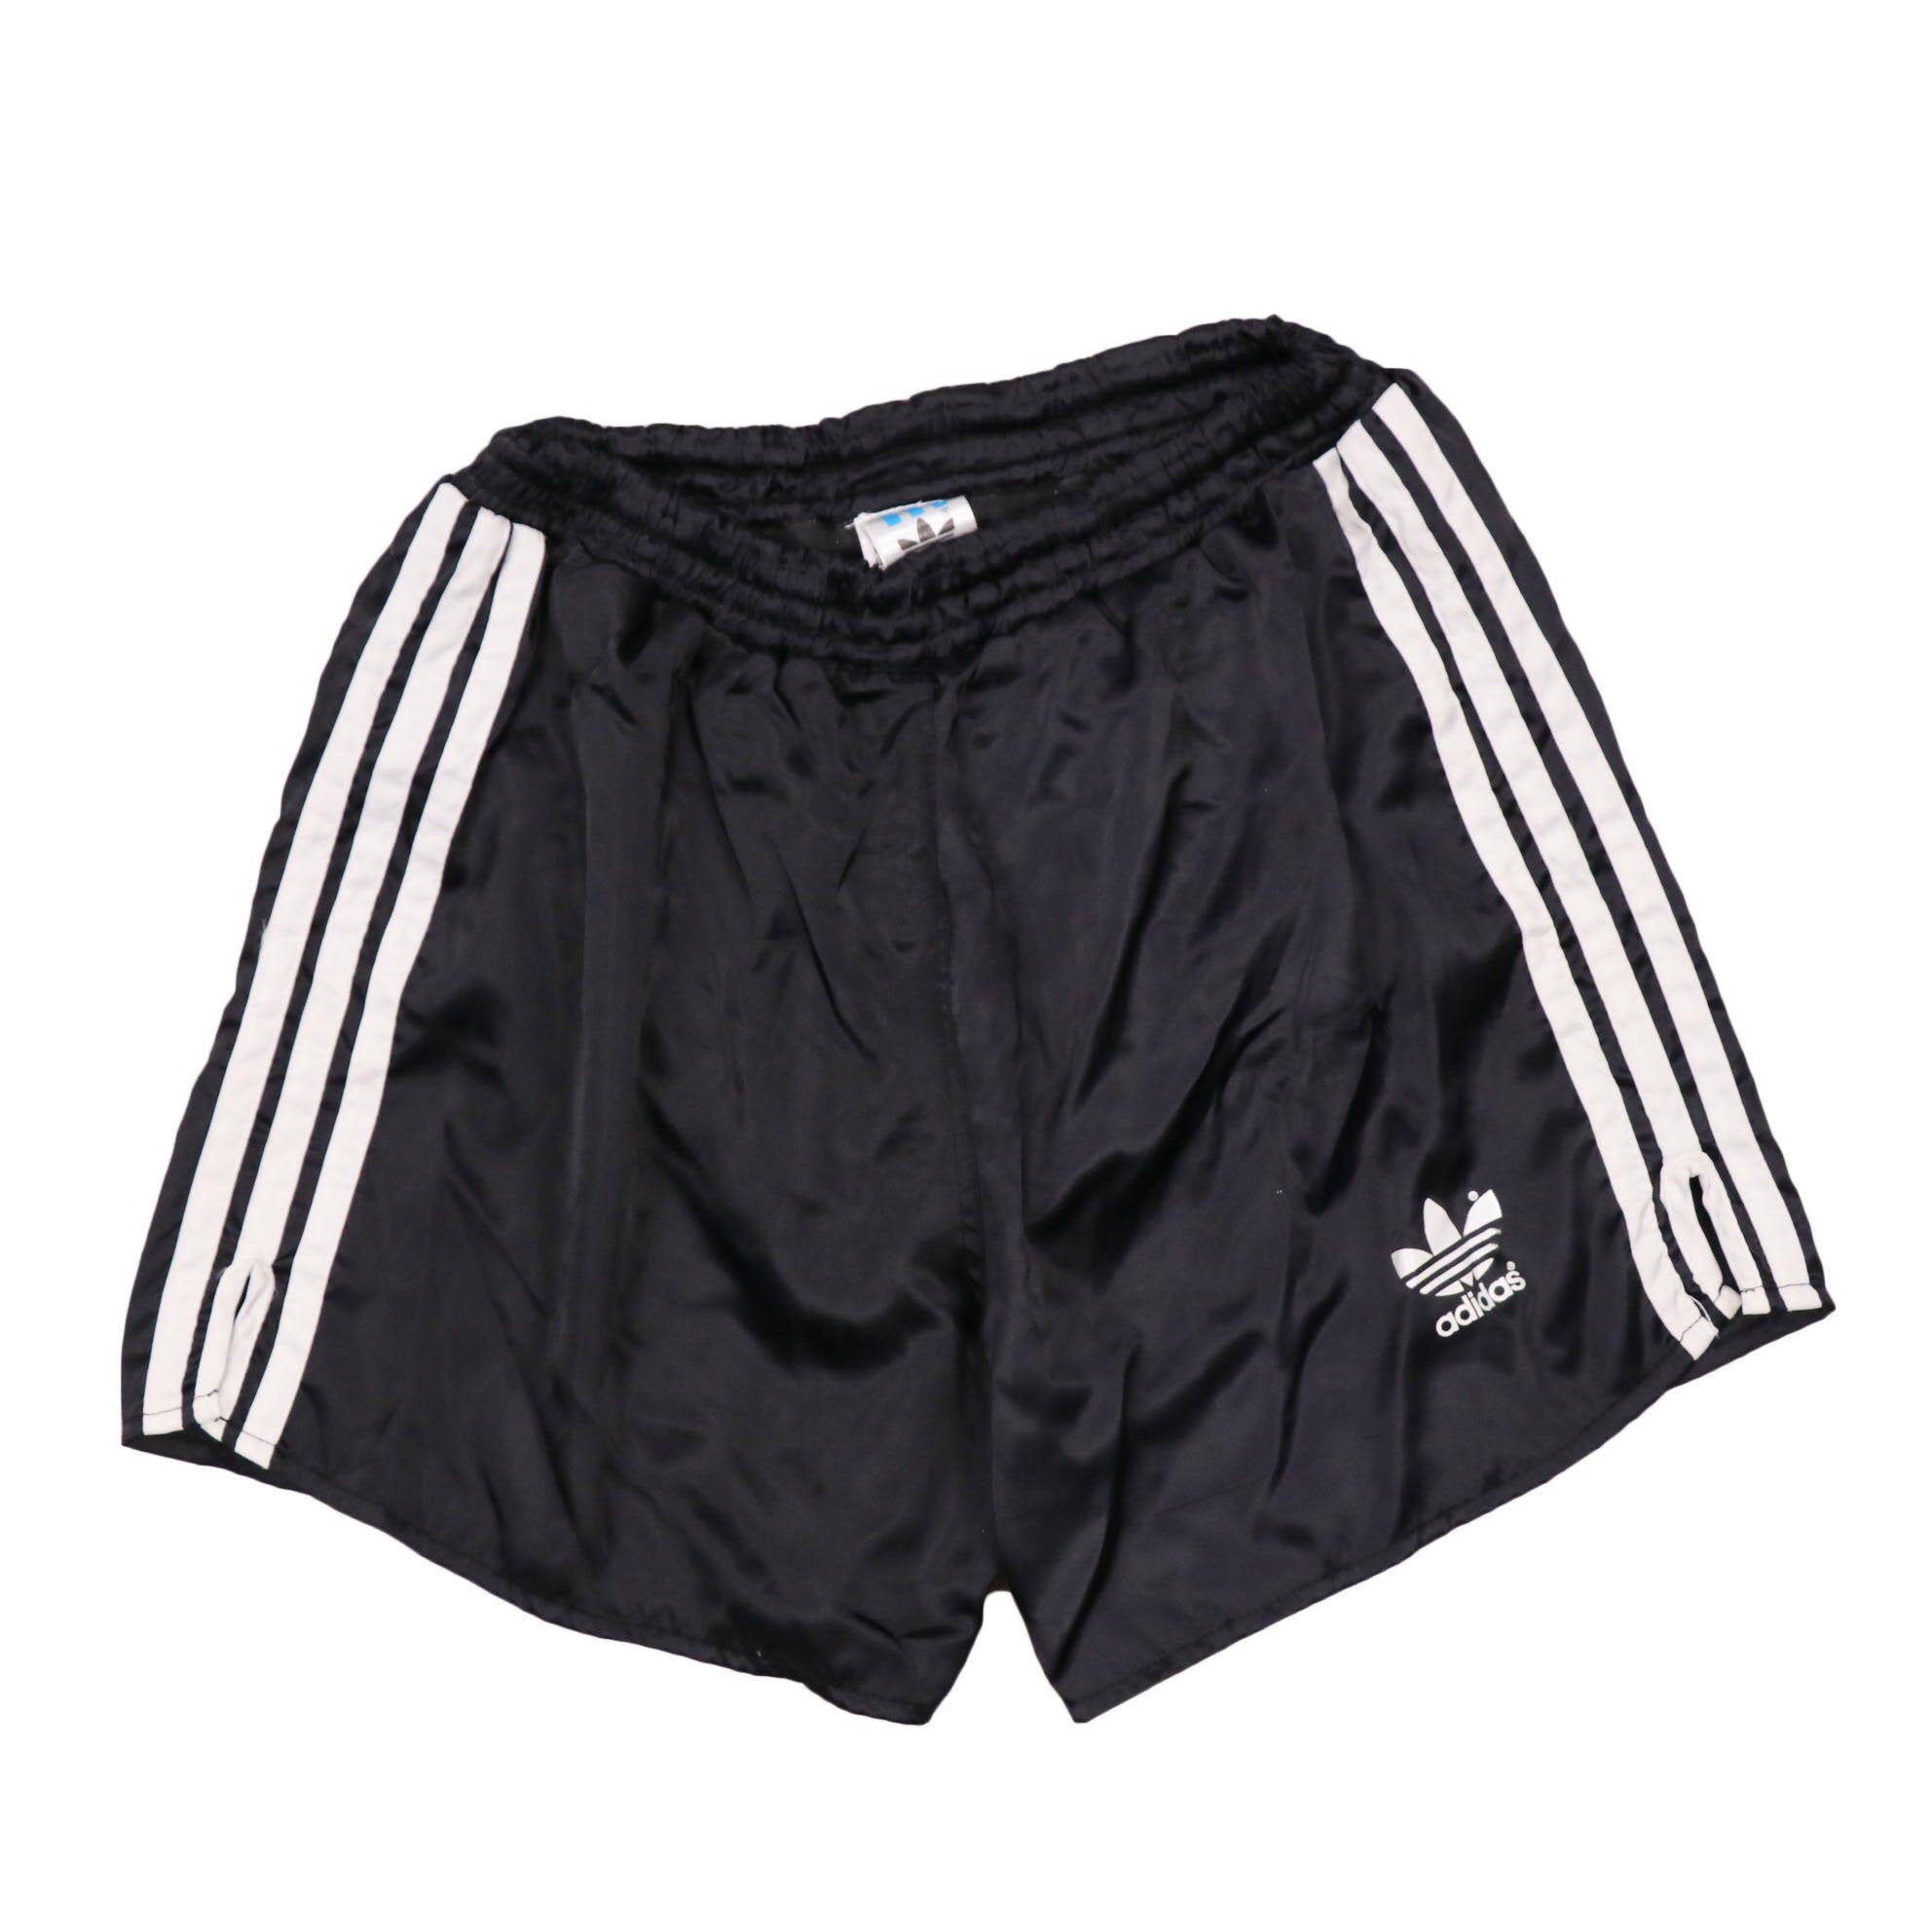 calcetines pálido Generacion  Vintage 80s 90s adidas running shorts original classic logo in 2020 | Adidas  retro, Running shorts, Adidas running